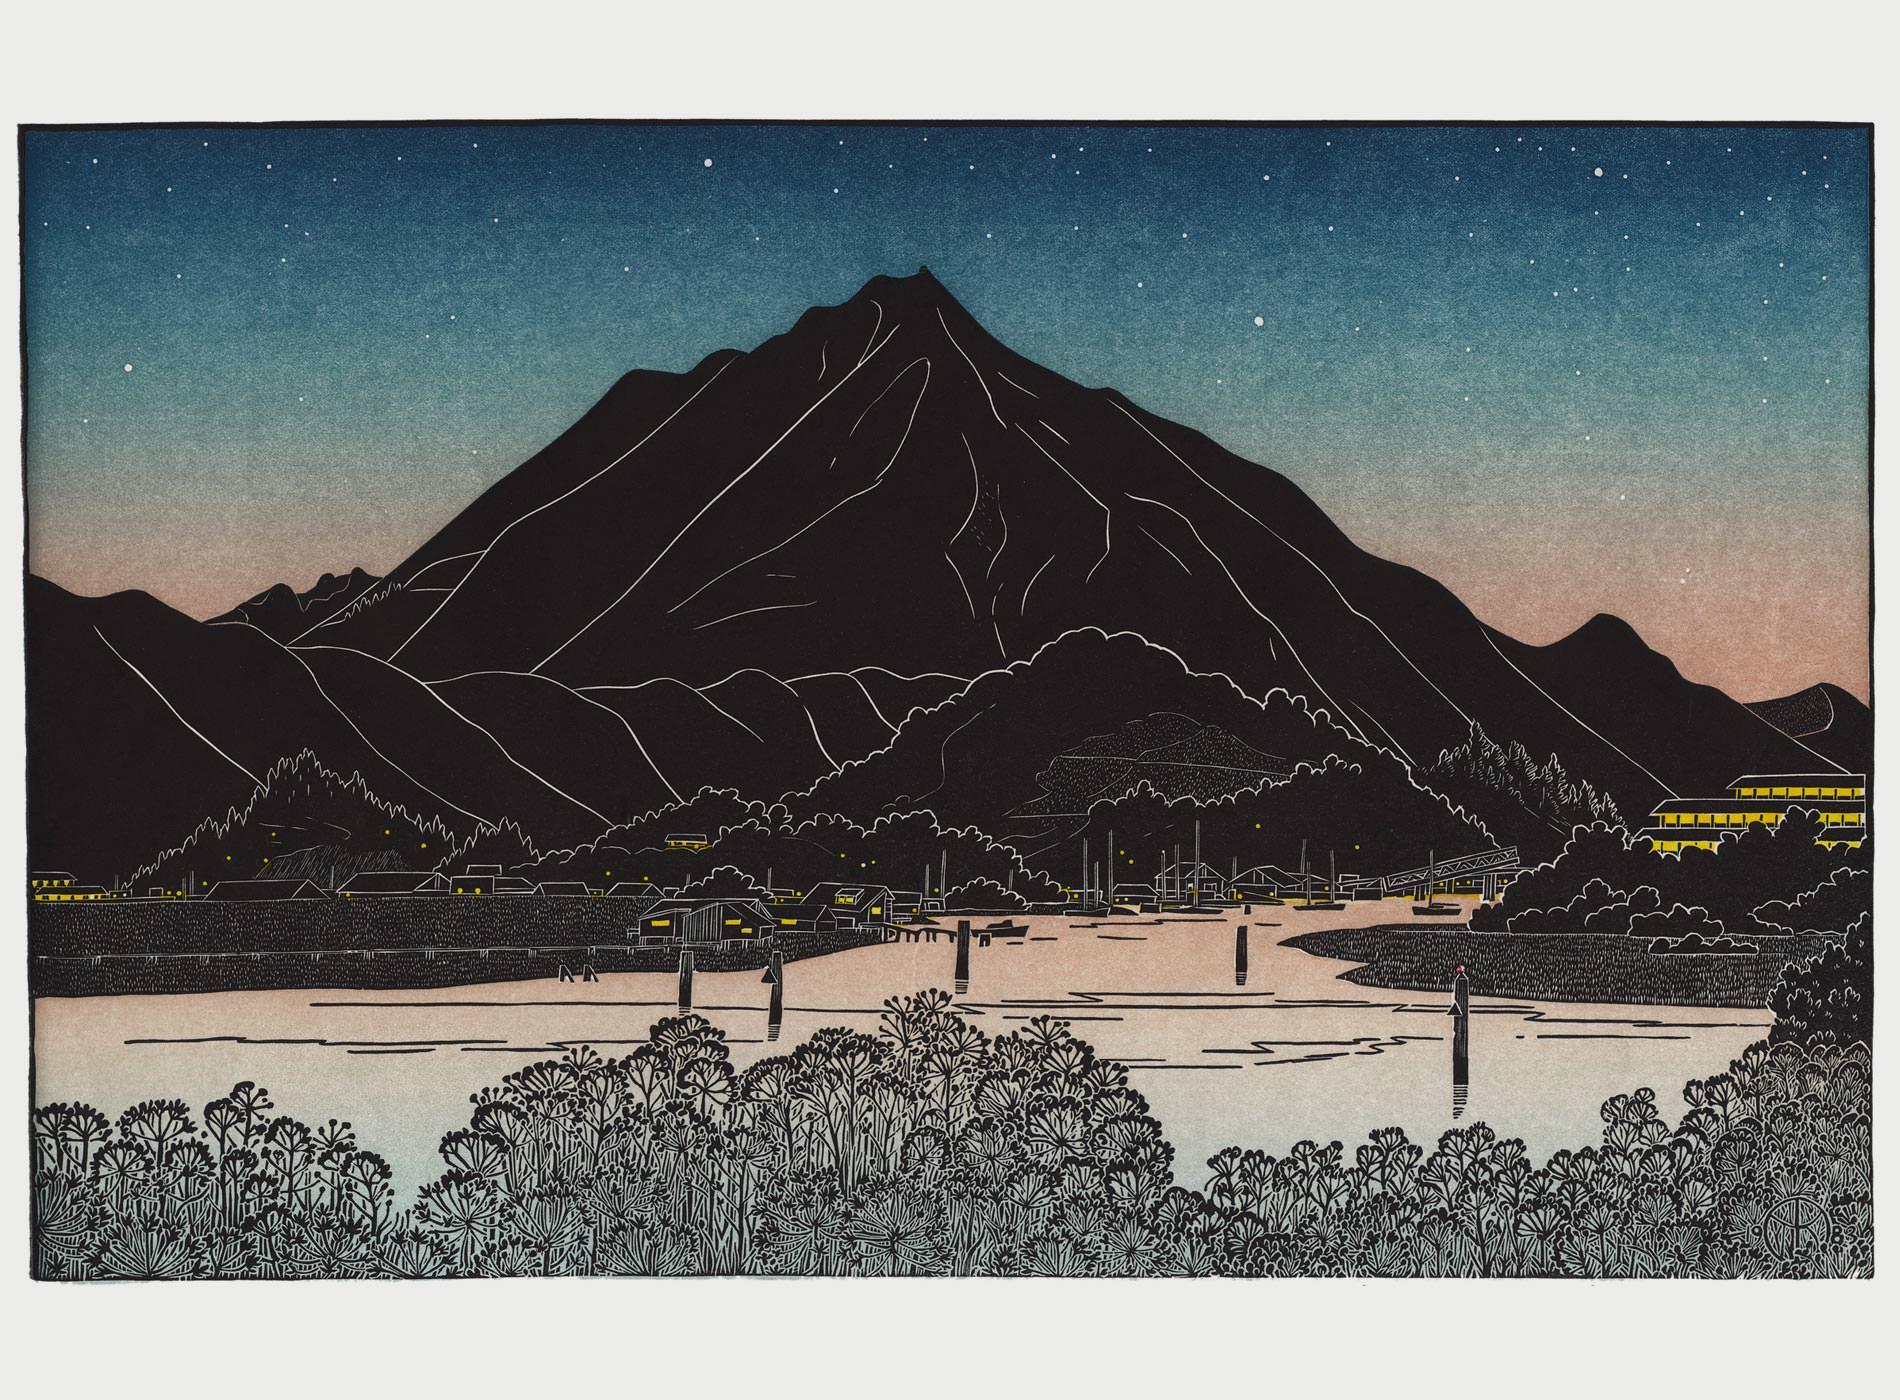 Tom Killion Gravures Bois Linogravures WoodCut LinoCut Prints Inspiration Katsushika Hokusai ukiyo-e